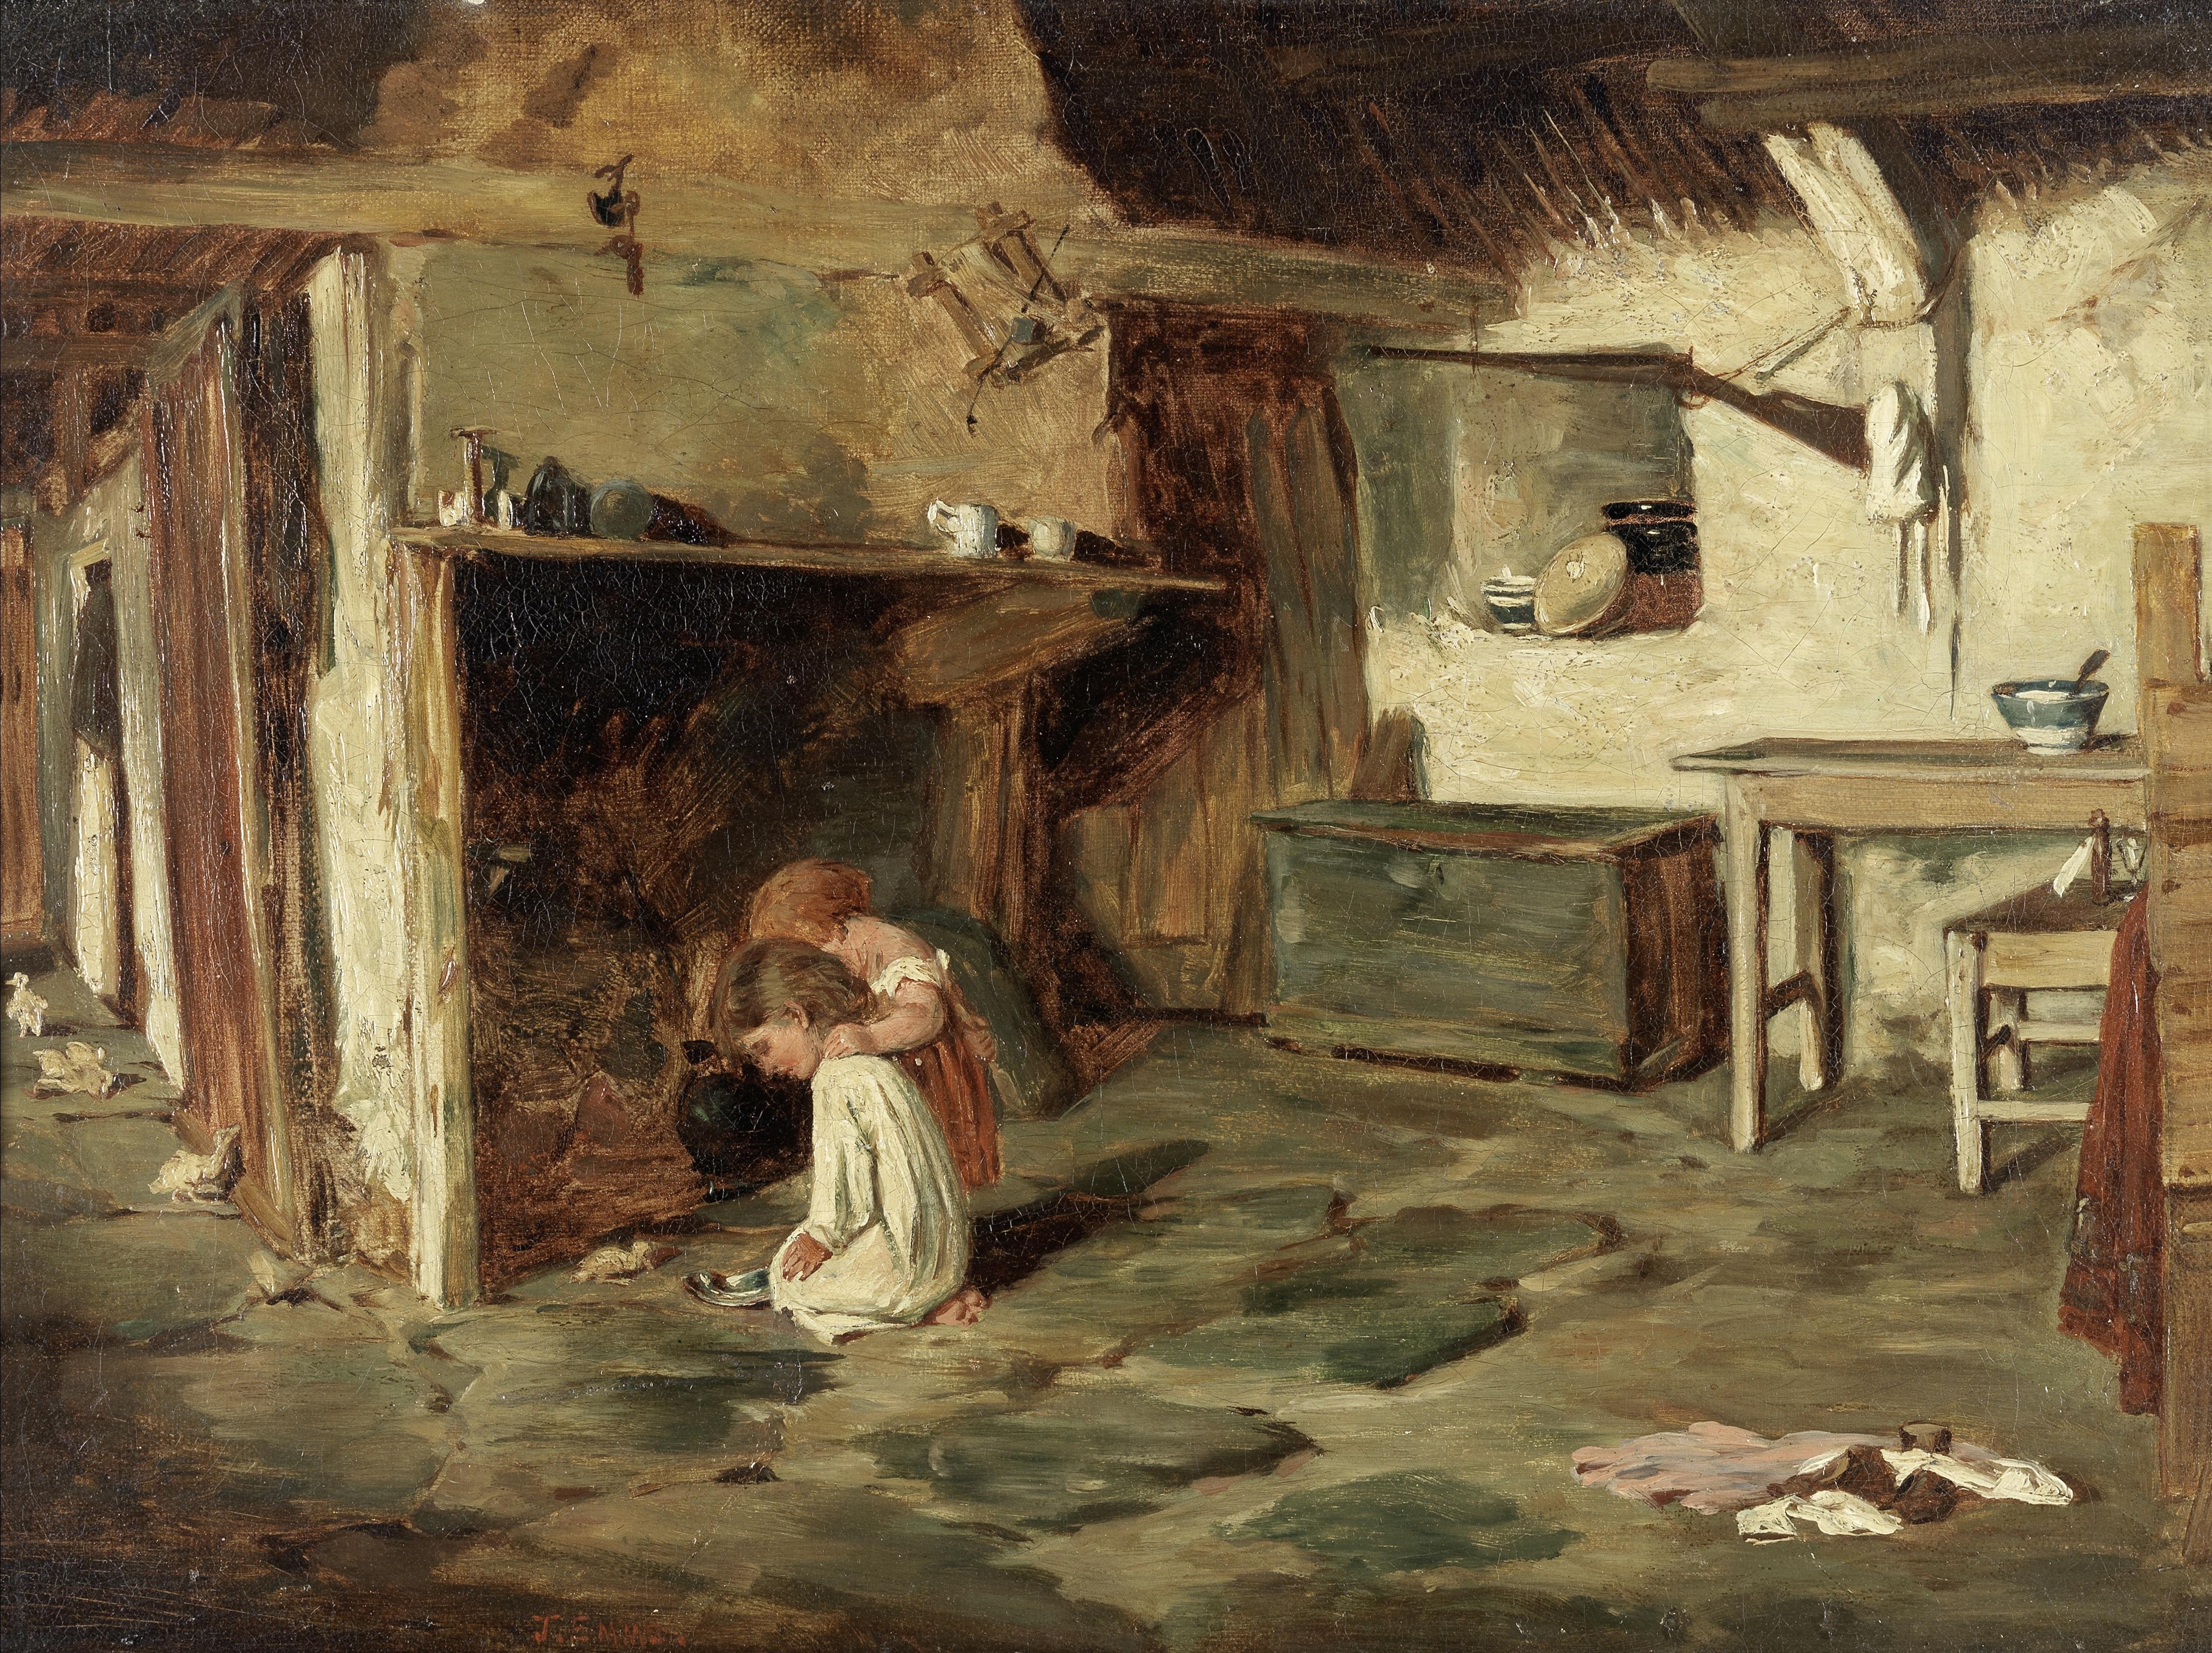 John Emms (British, 1843-1912) Feeding ducklings